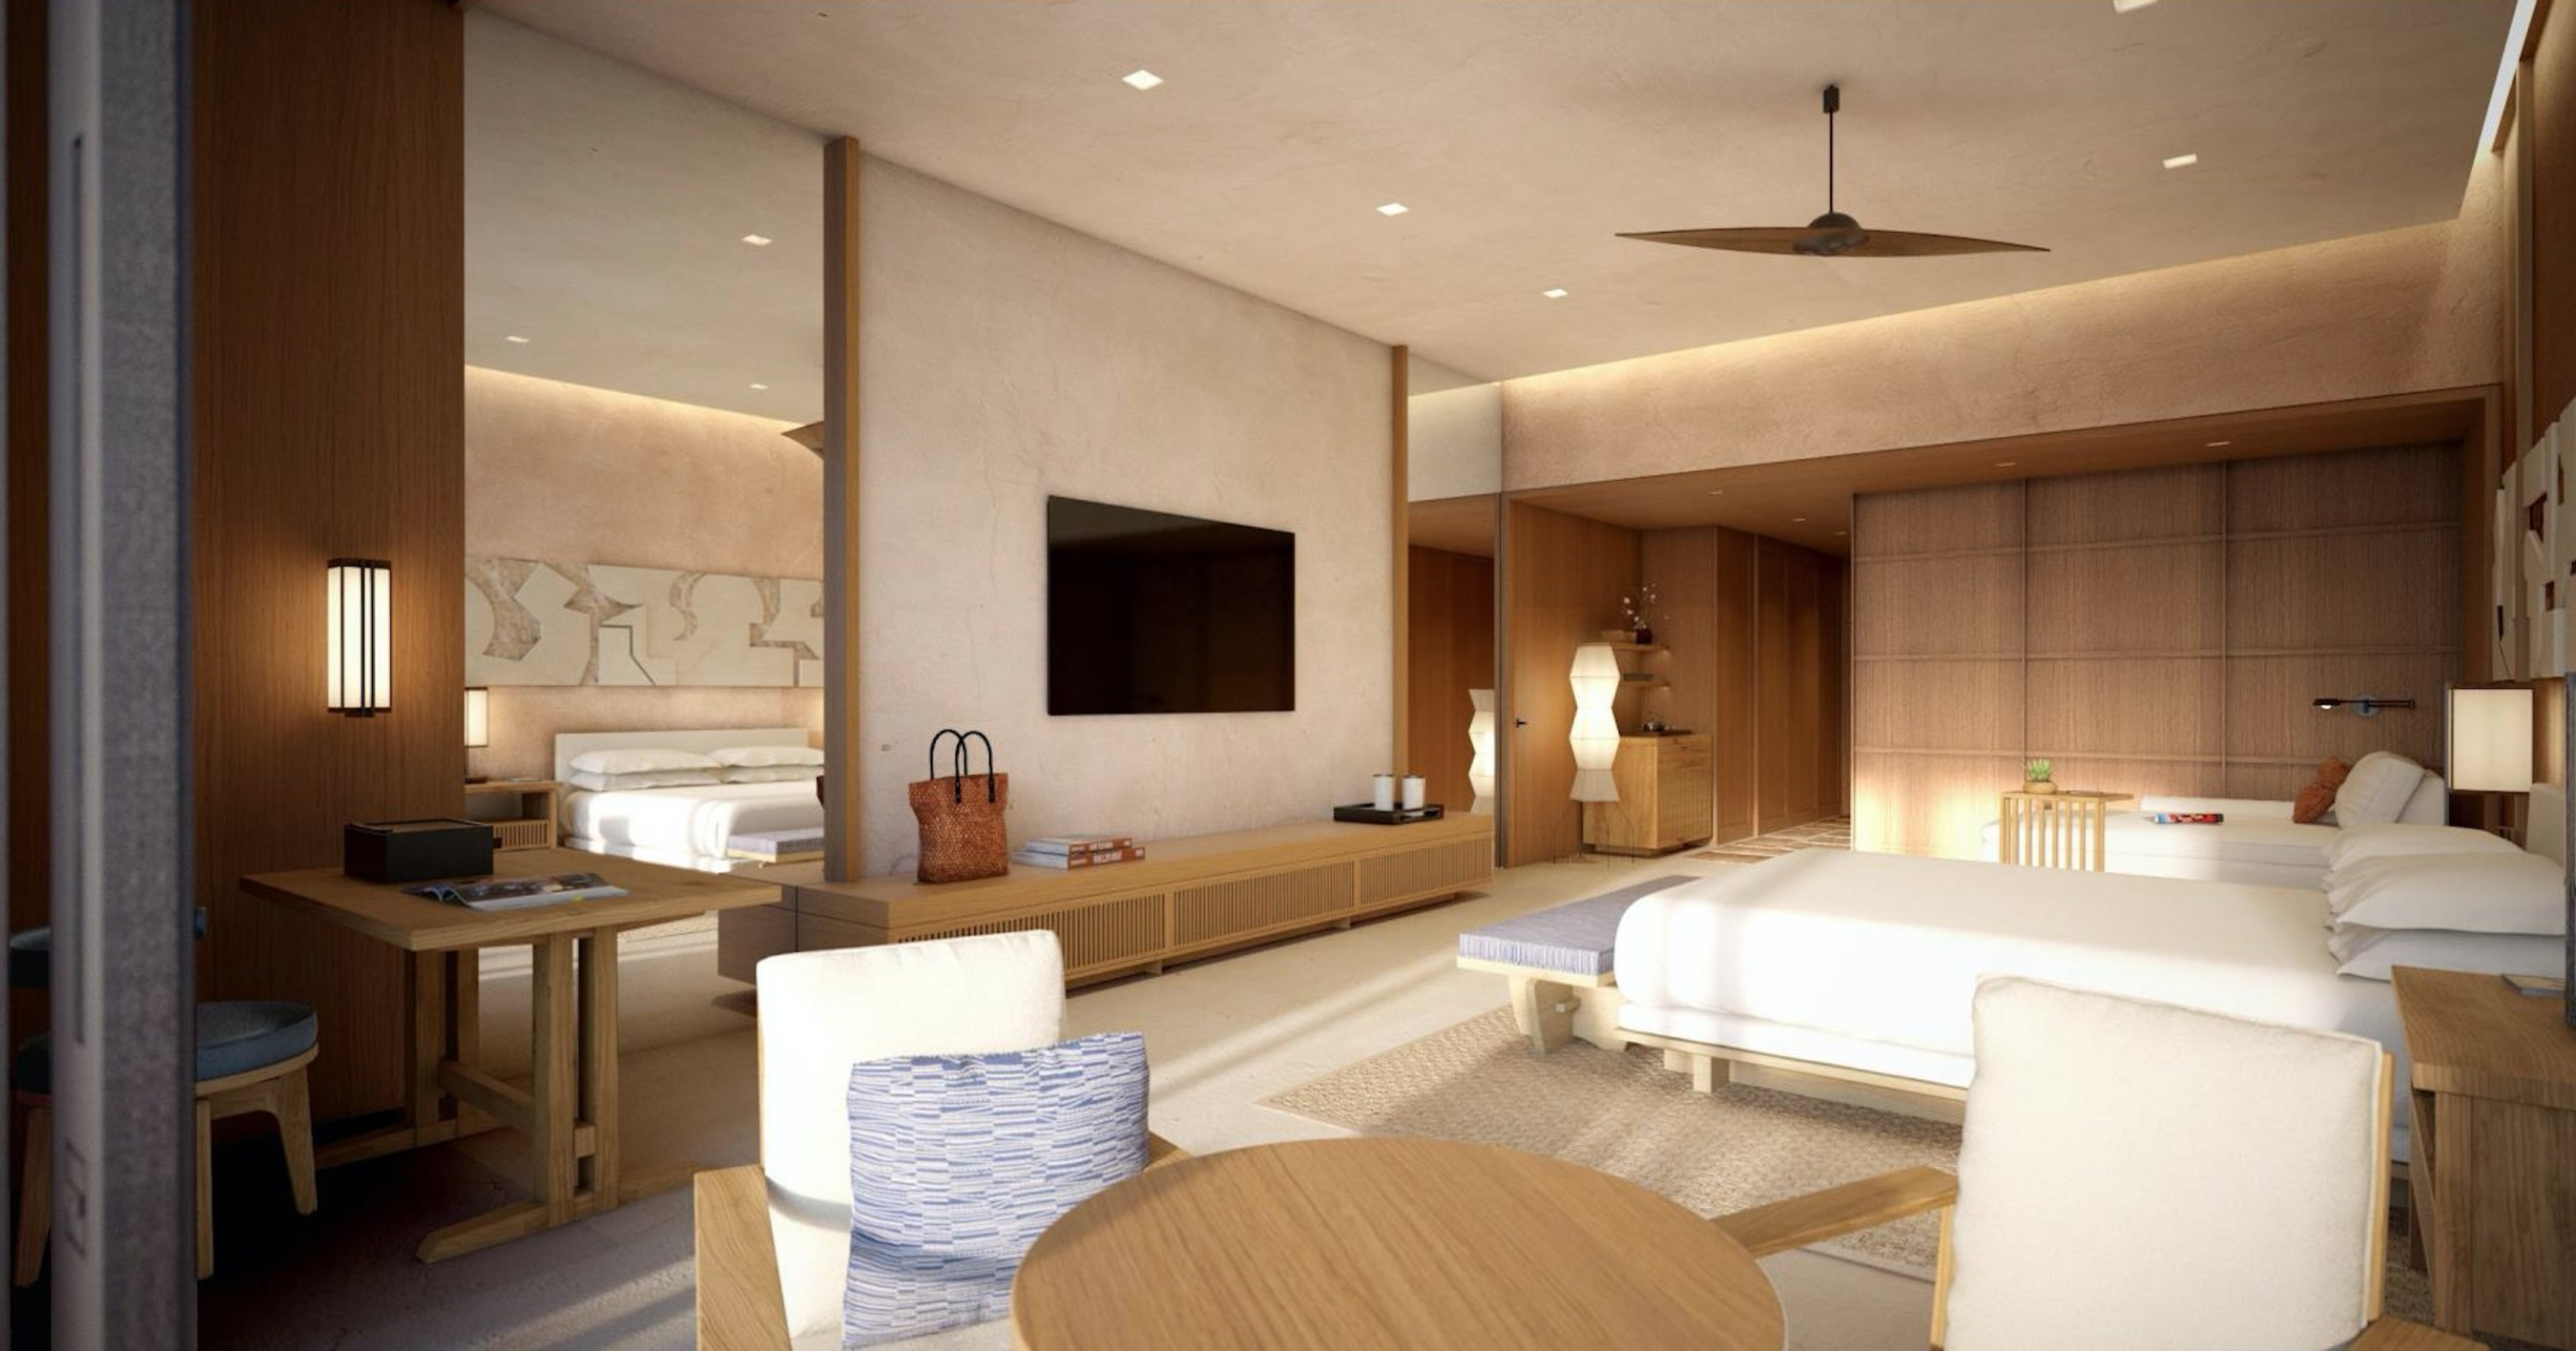 Crown Investment Holdings adquiere interés de propiedad en Nobu Hospitality and Restaurant Group